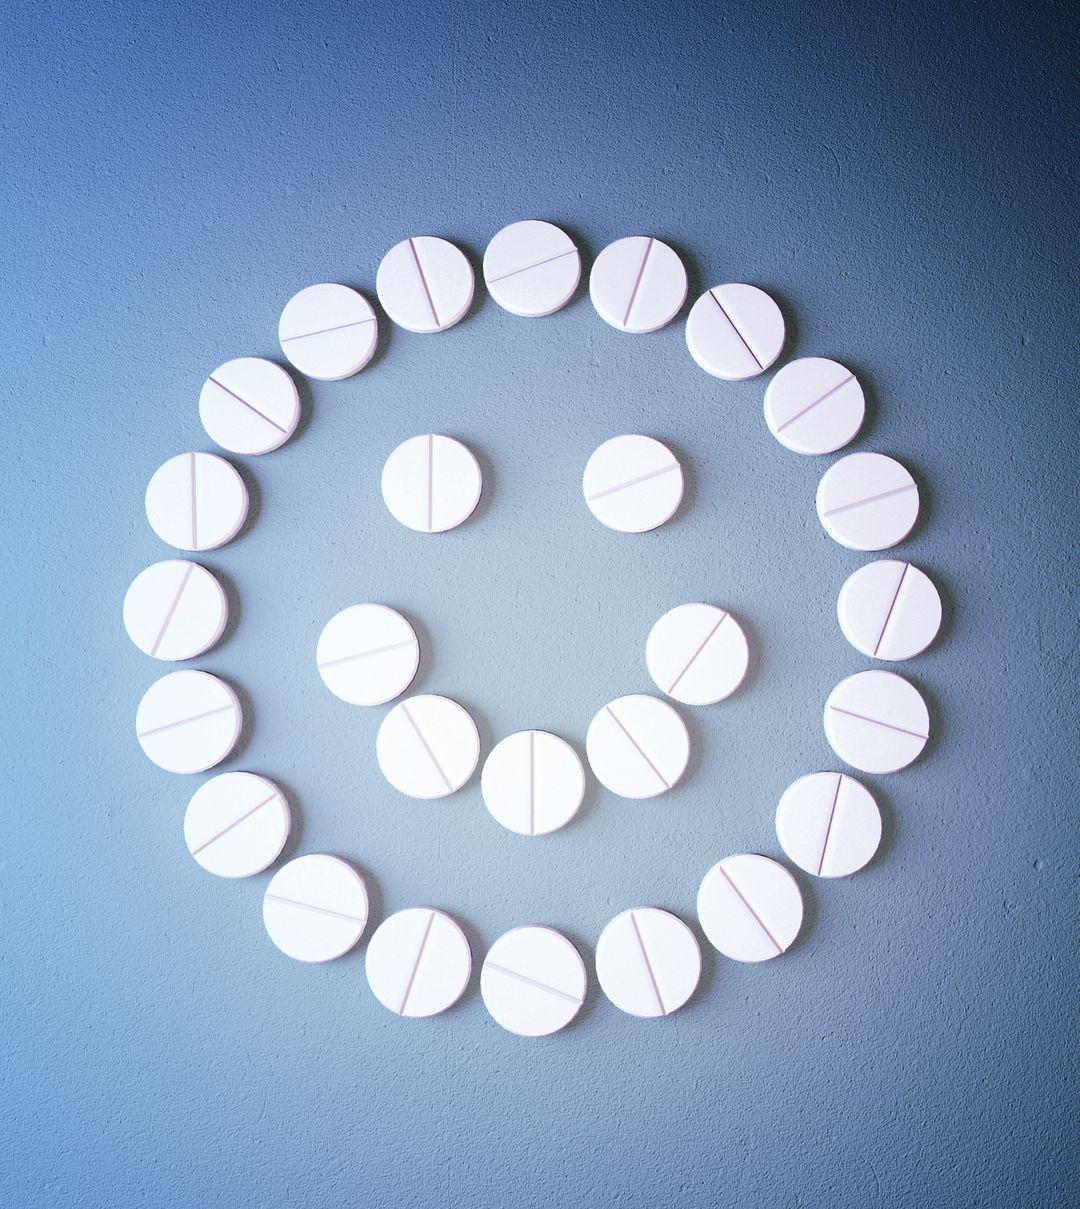 Chatterbox pills bind3x